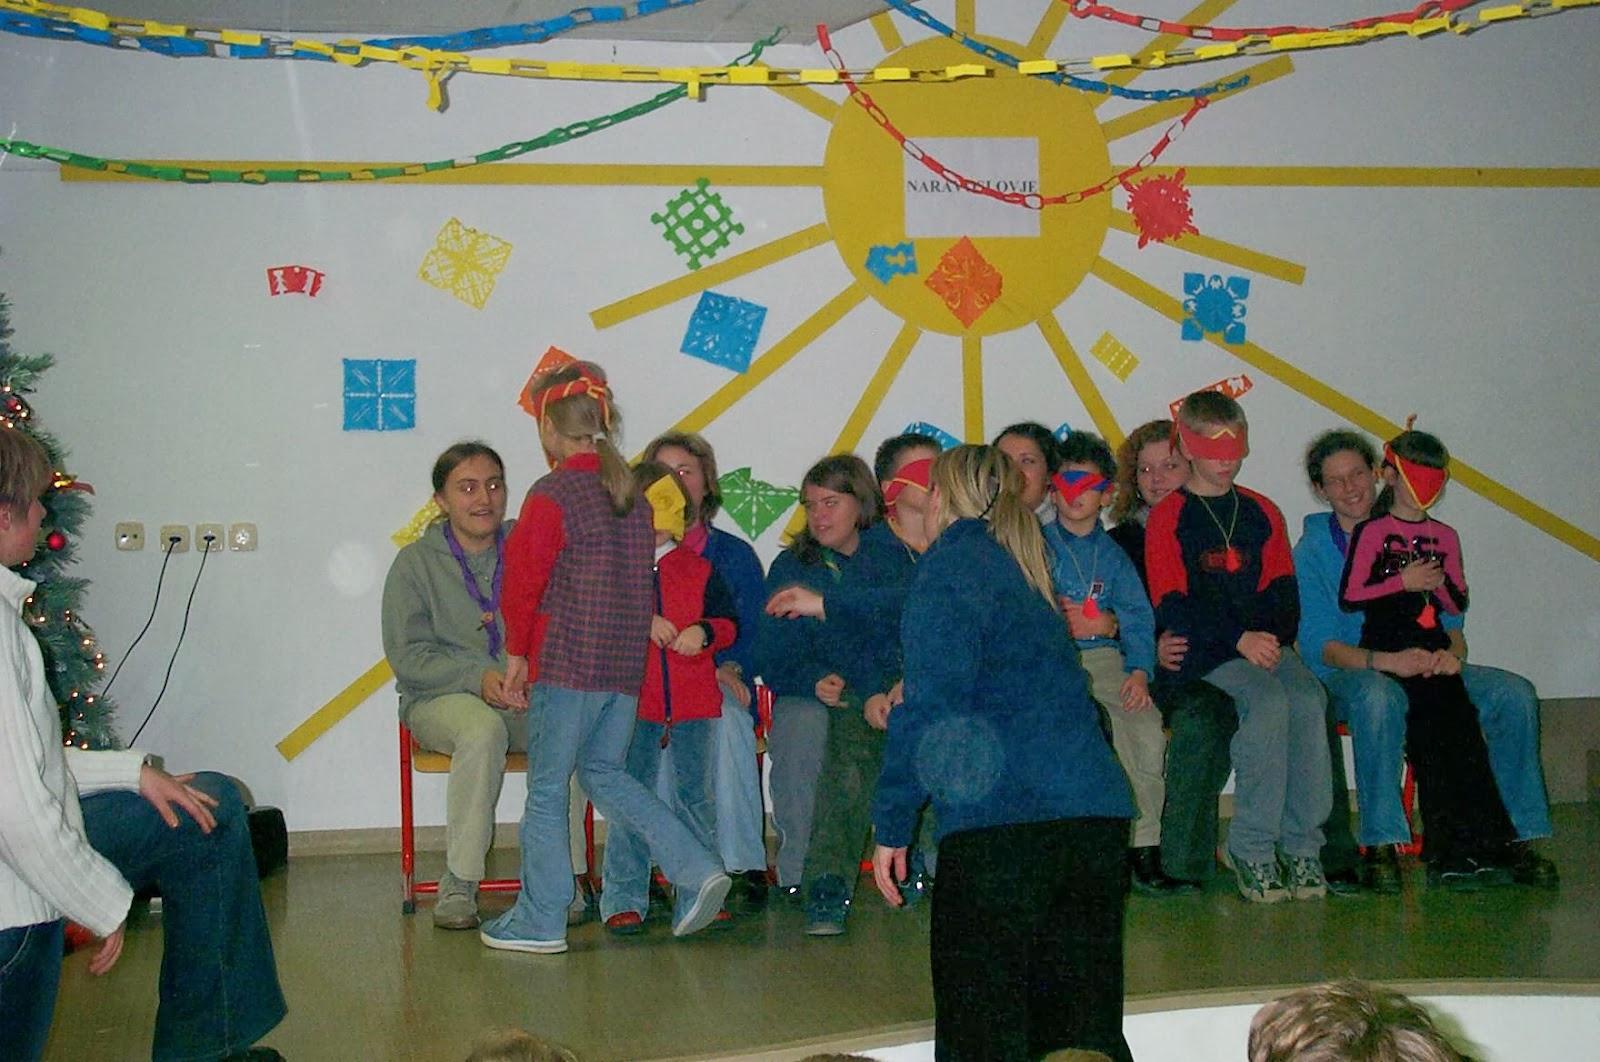 Čajanka, Ilirska Bistrica 2003 - Slika%2B035.jpg